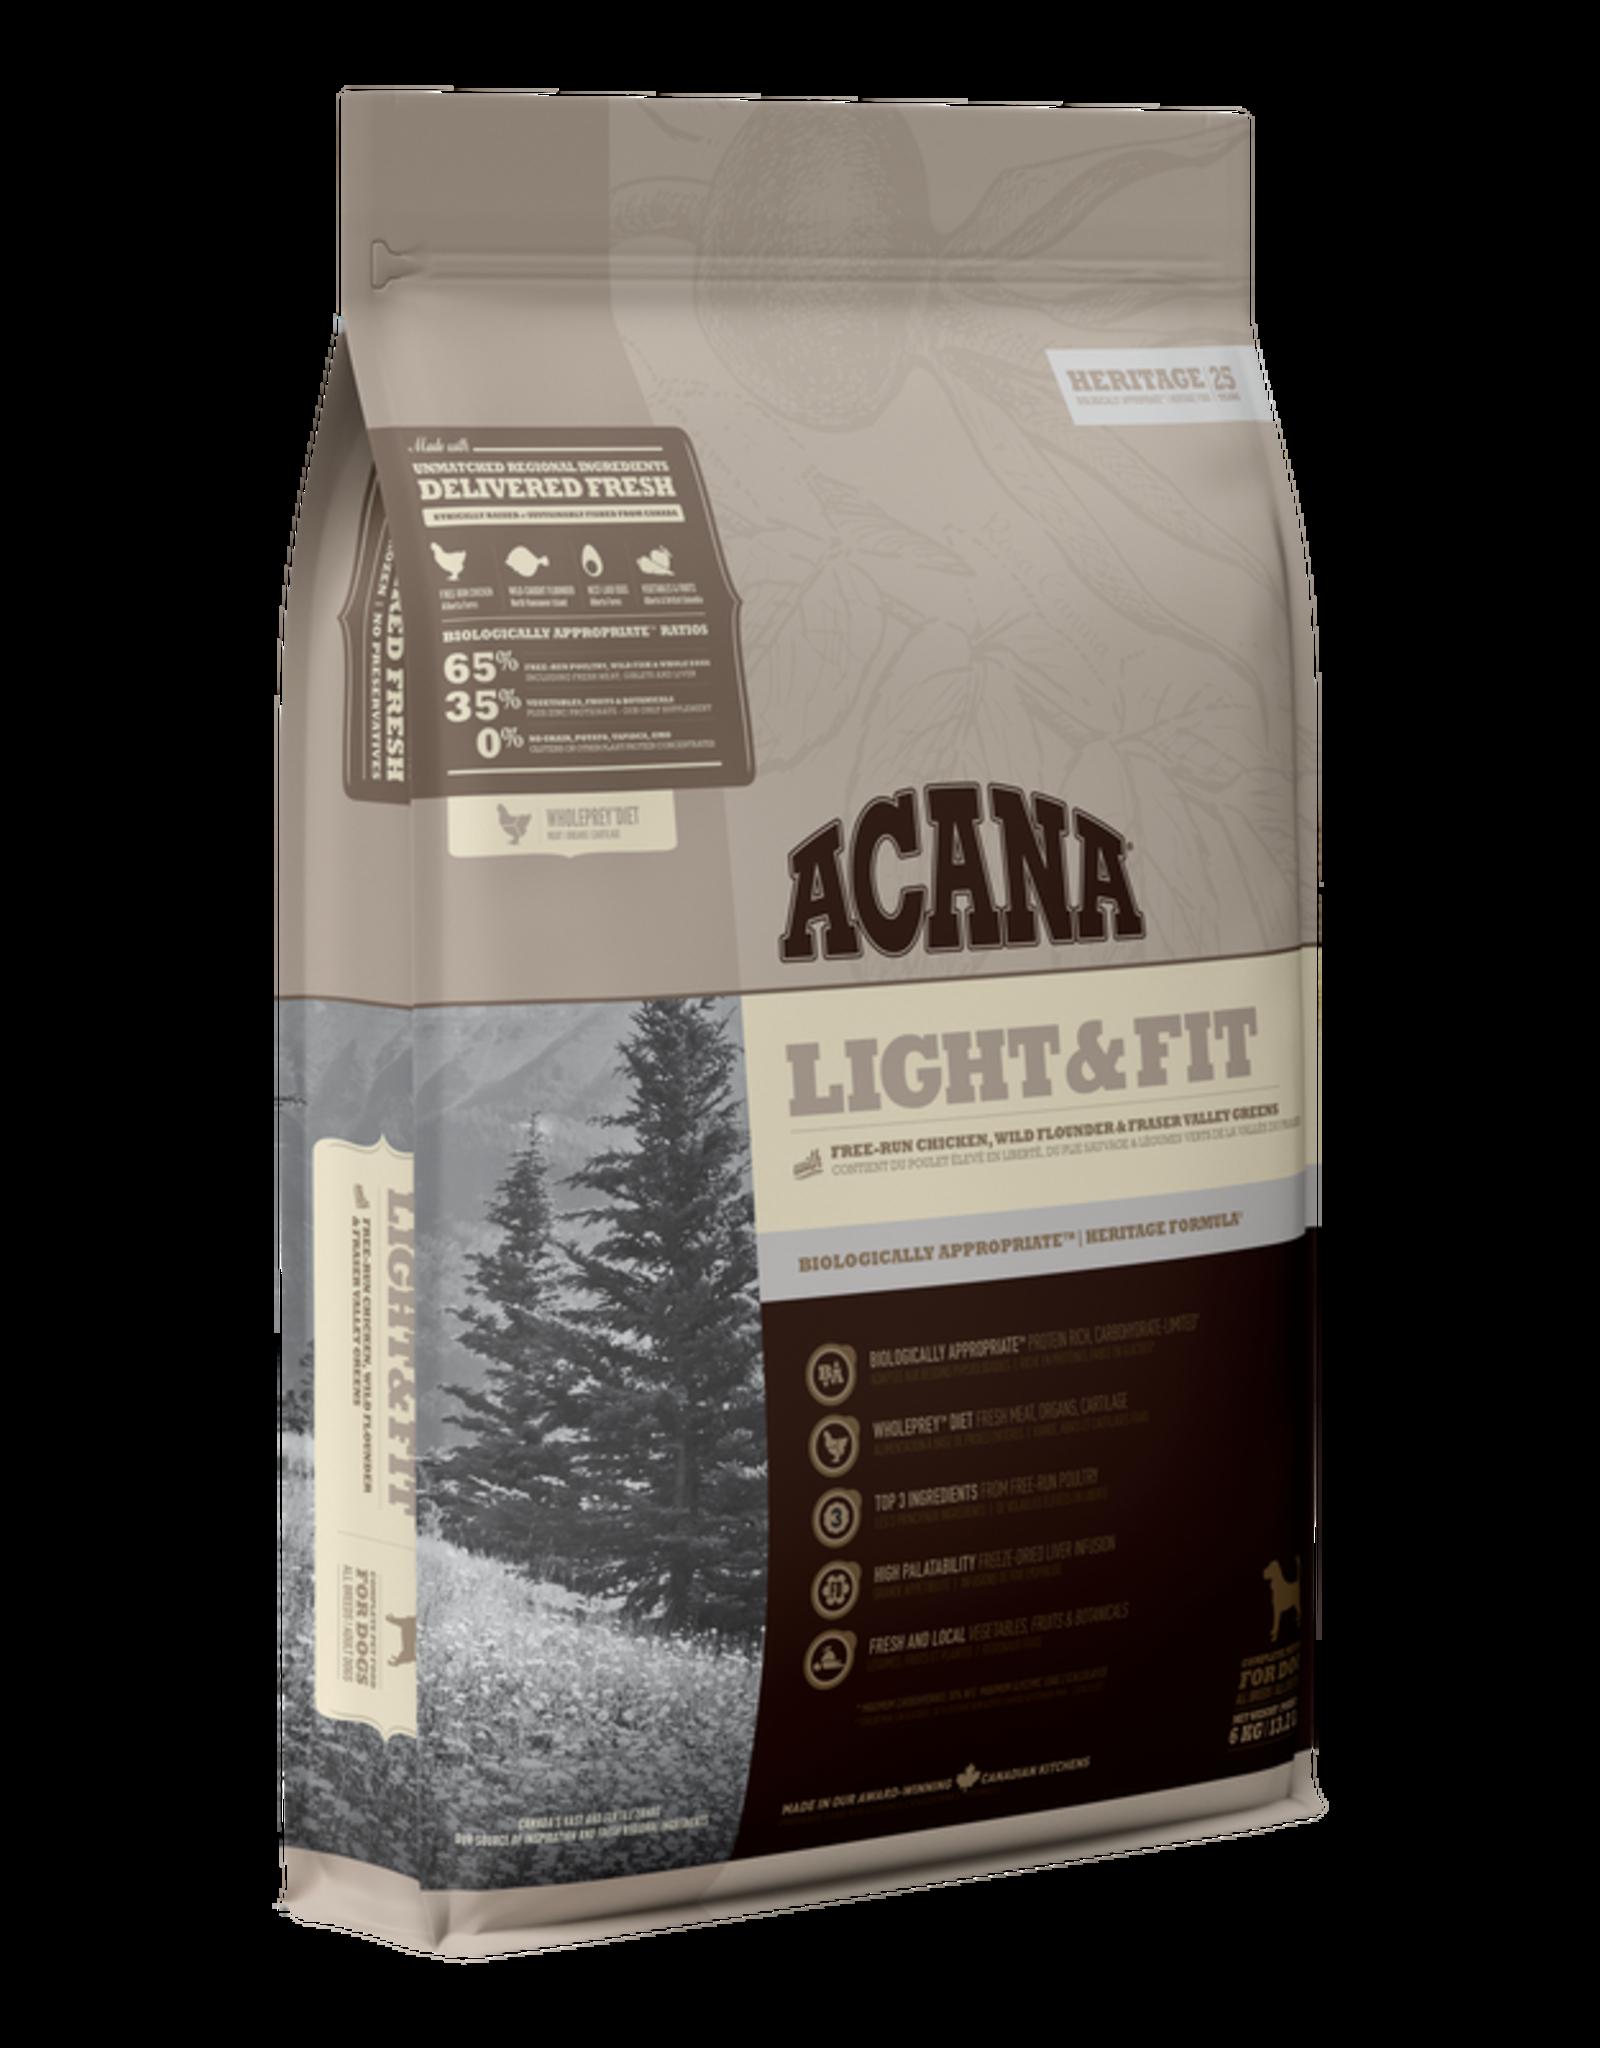 Acana - Heritage Light & Fit